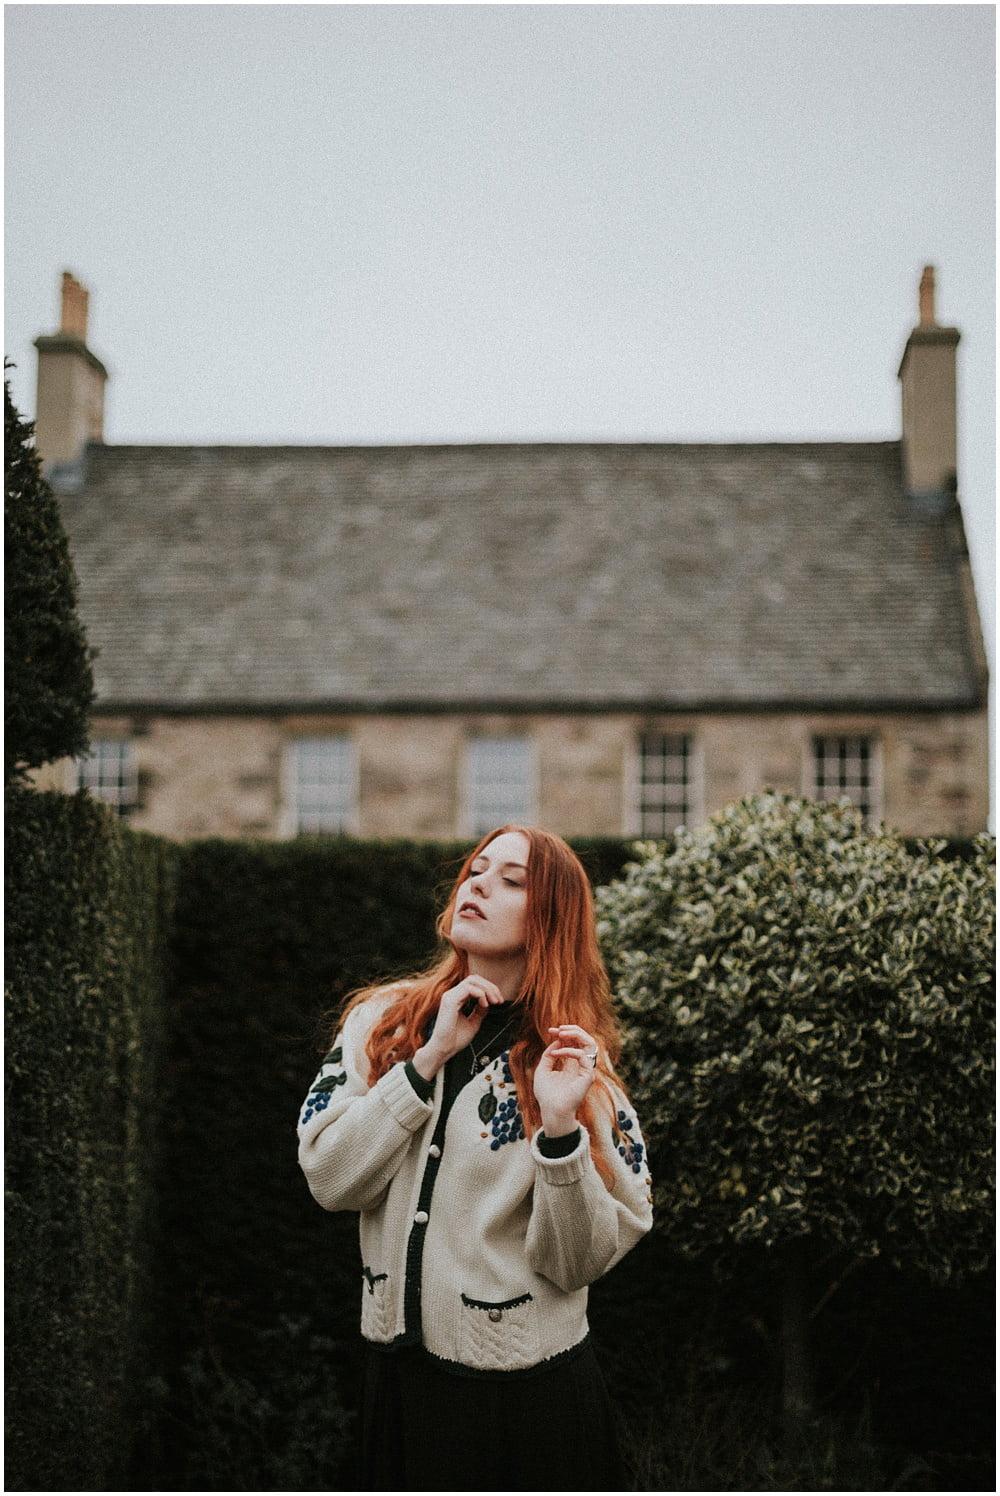 Edinburgh Portrait Session in Dunbar's Close, Edinburgh Secret Corner